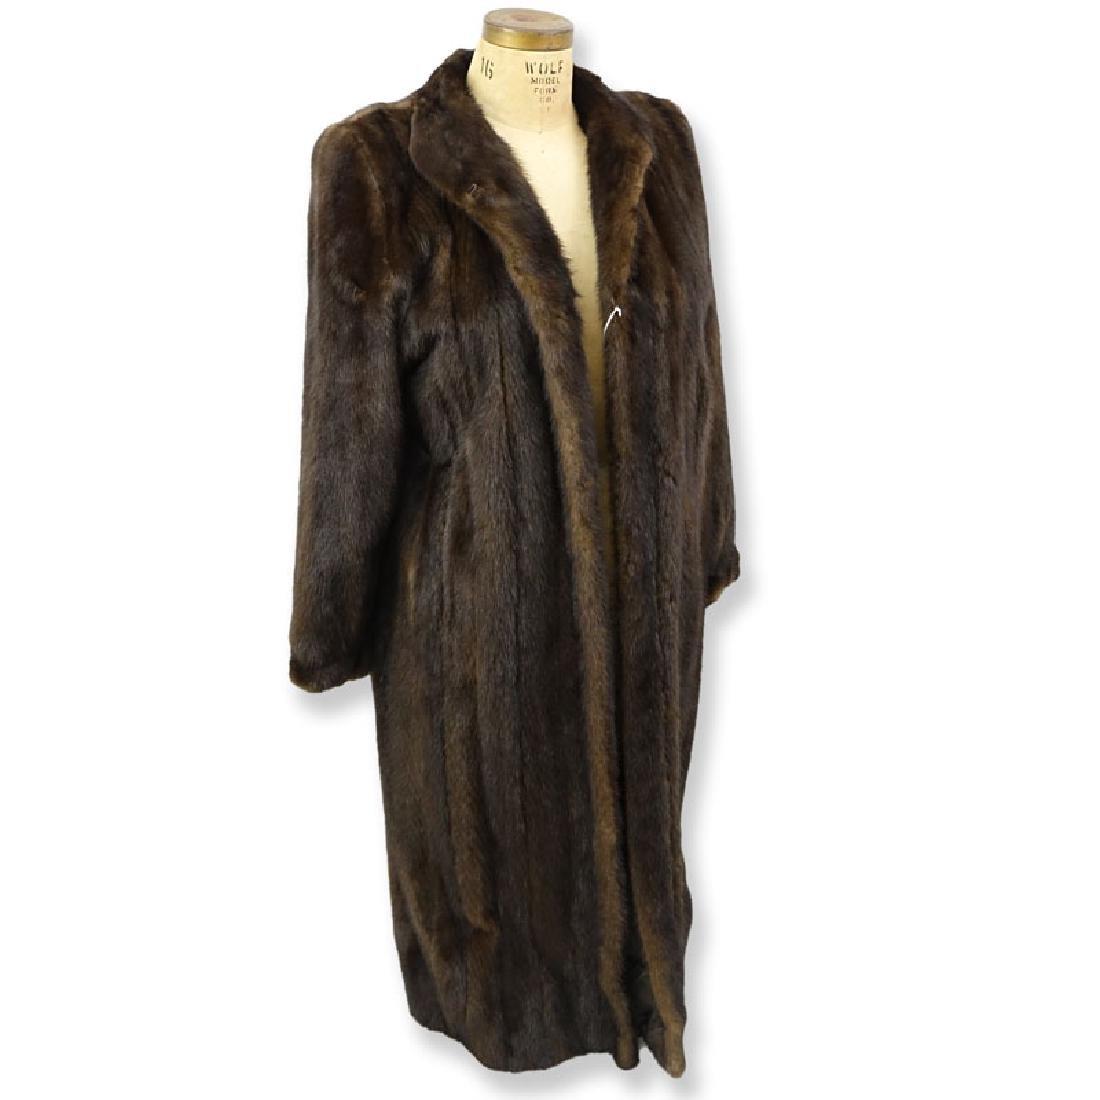 Vintage Antonovich Full Length Mink Coat